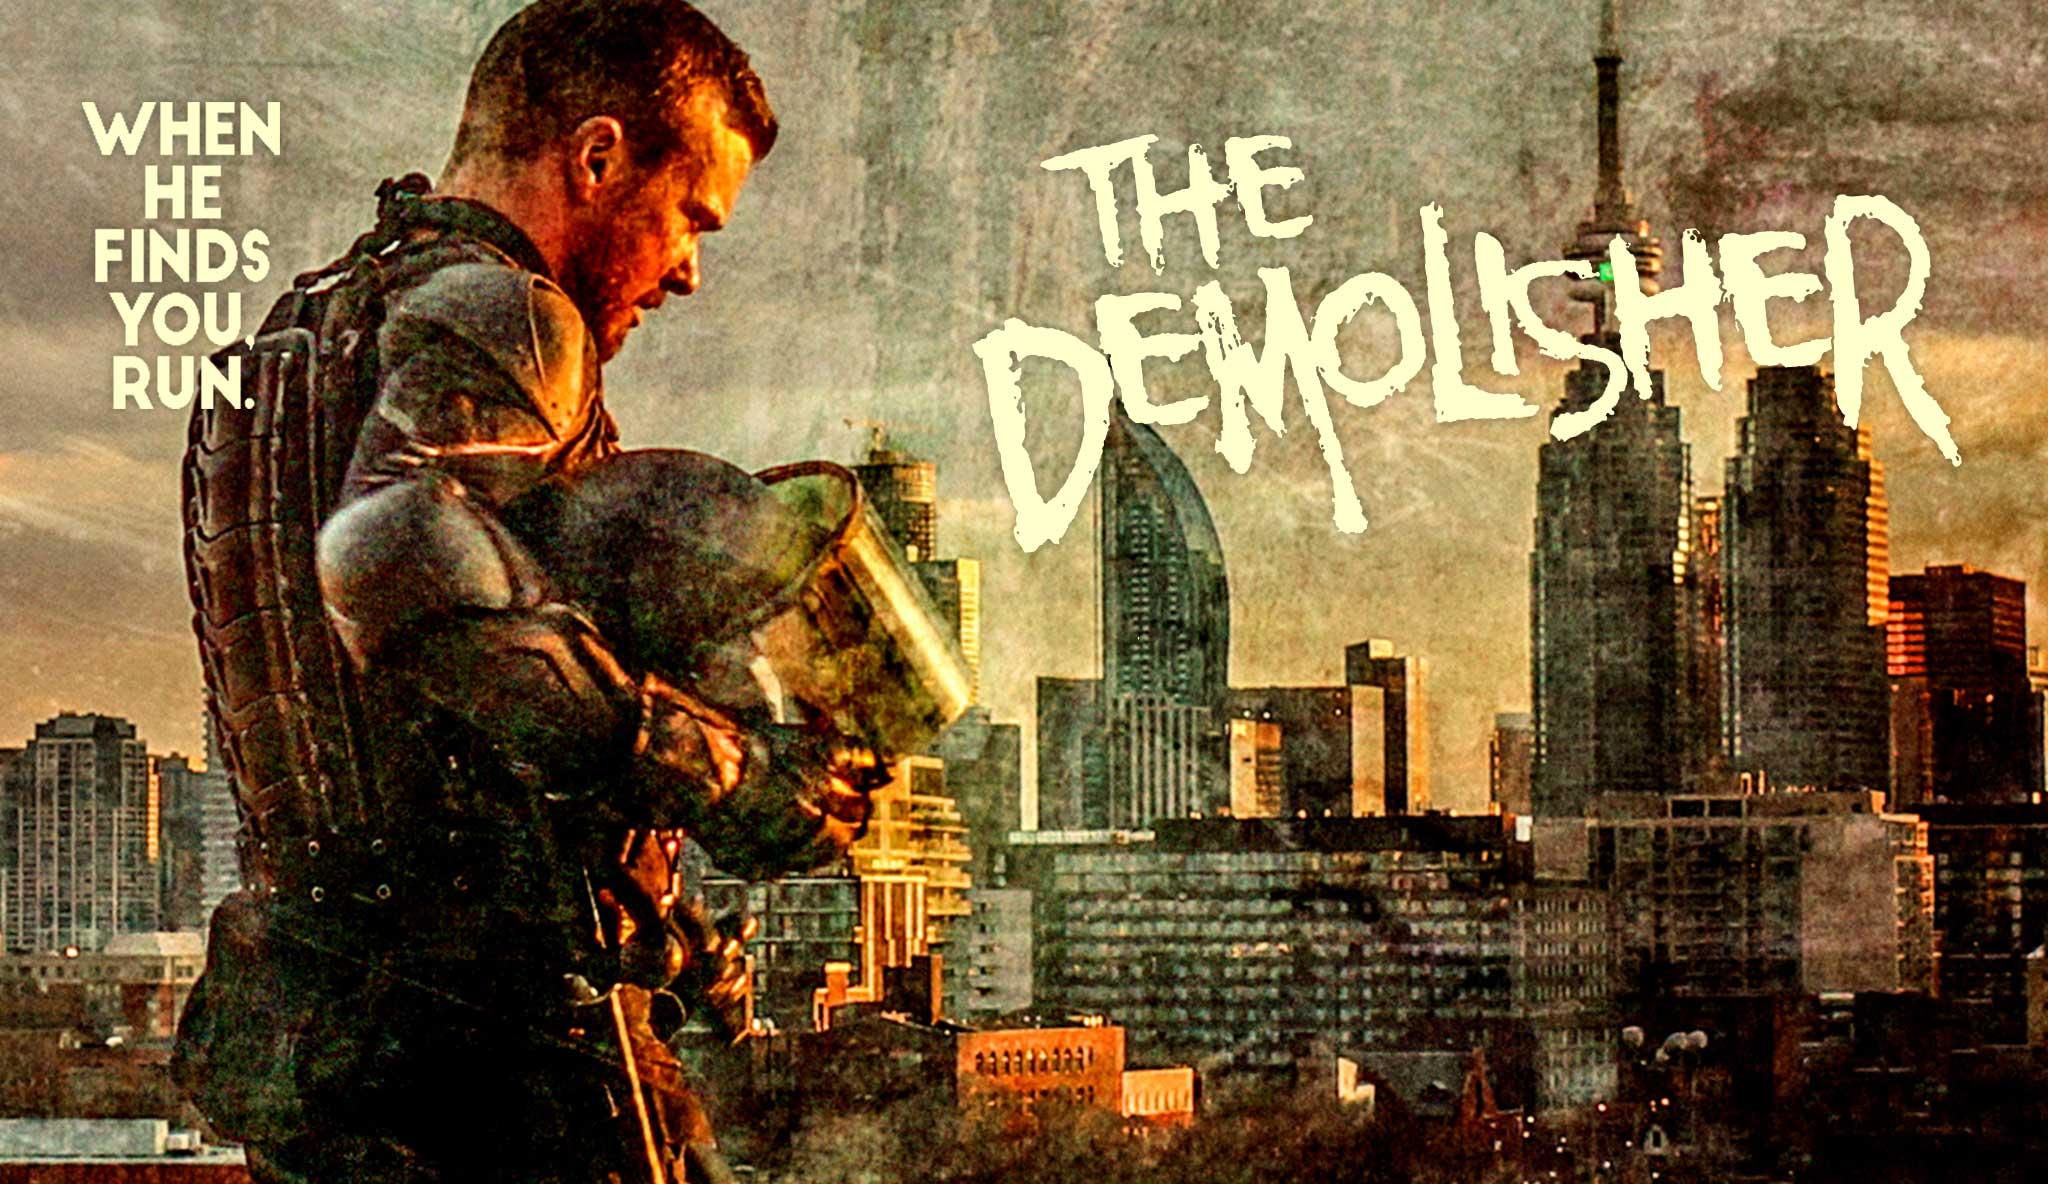 the-demolisher\header.jpg